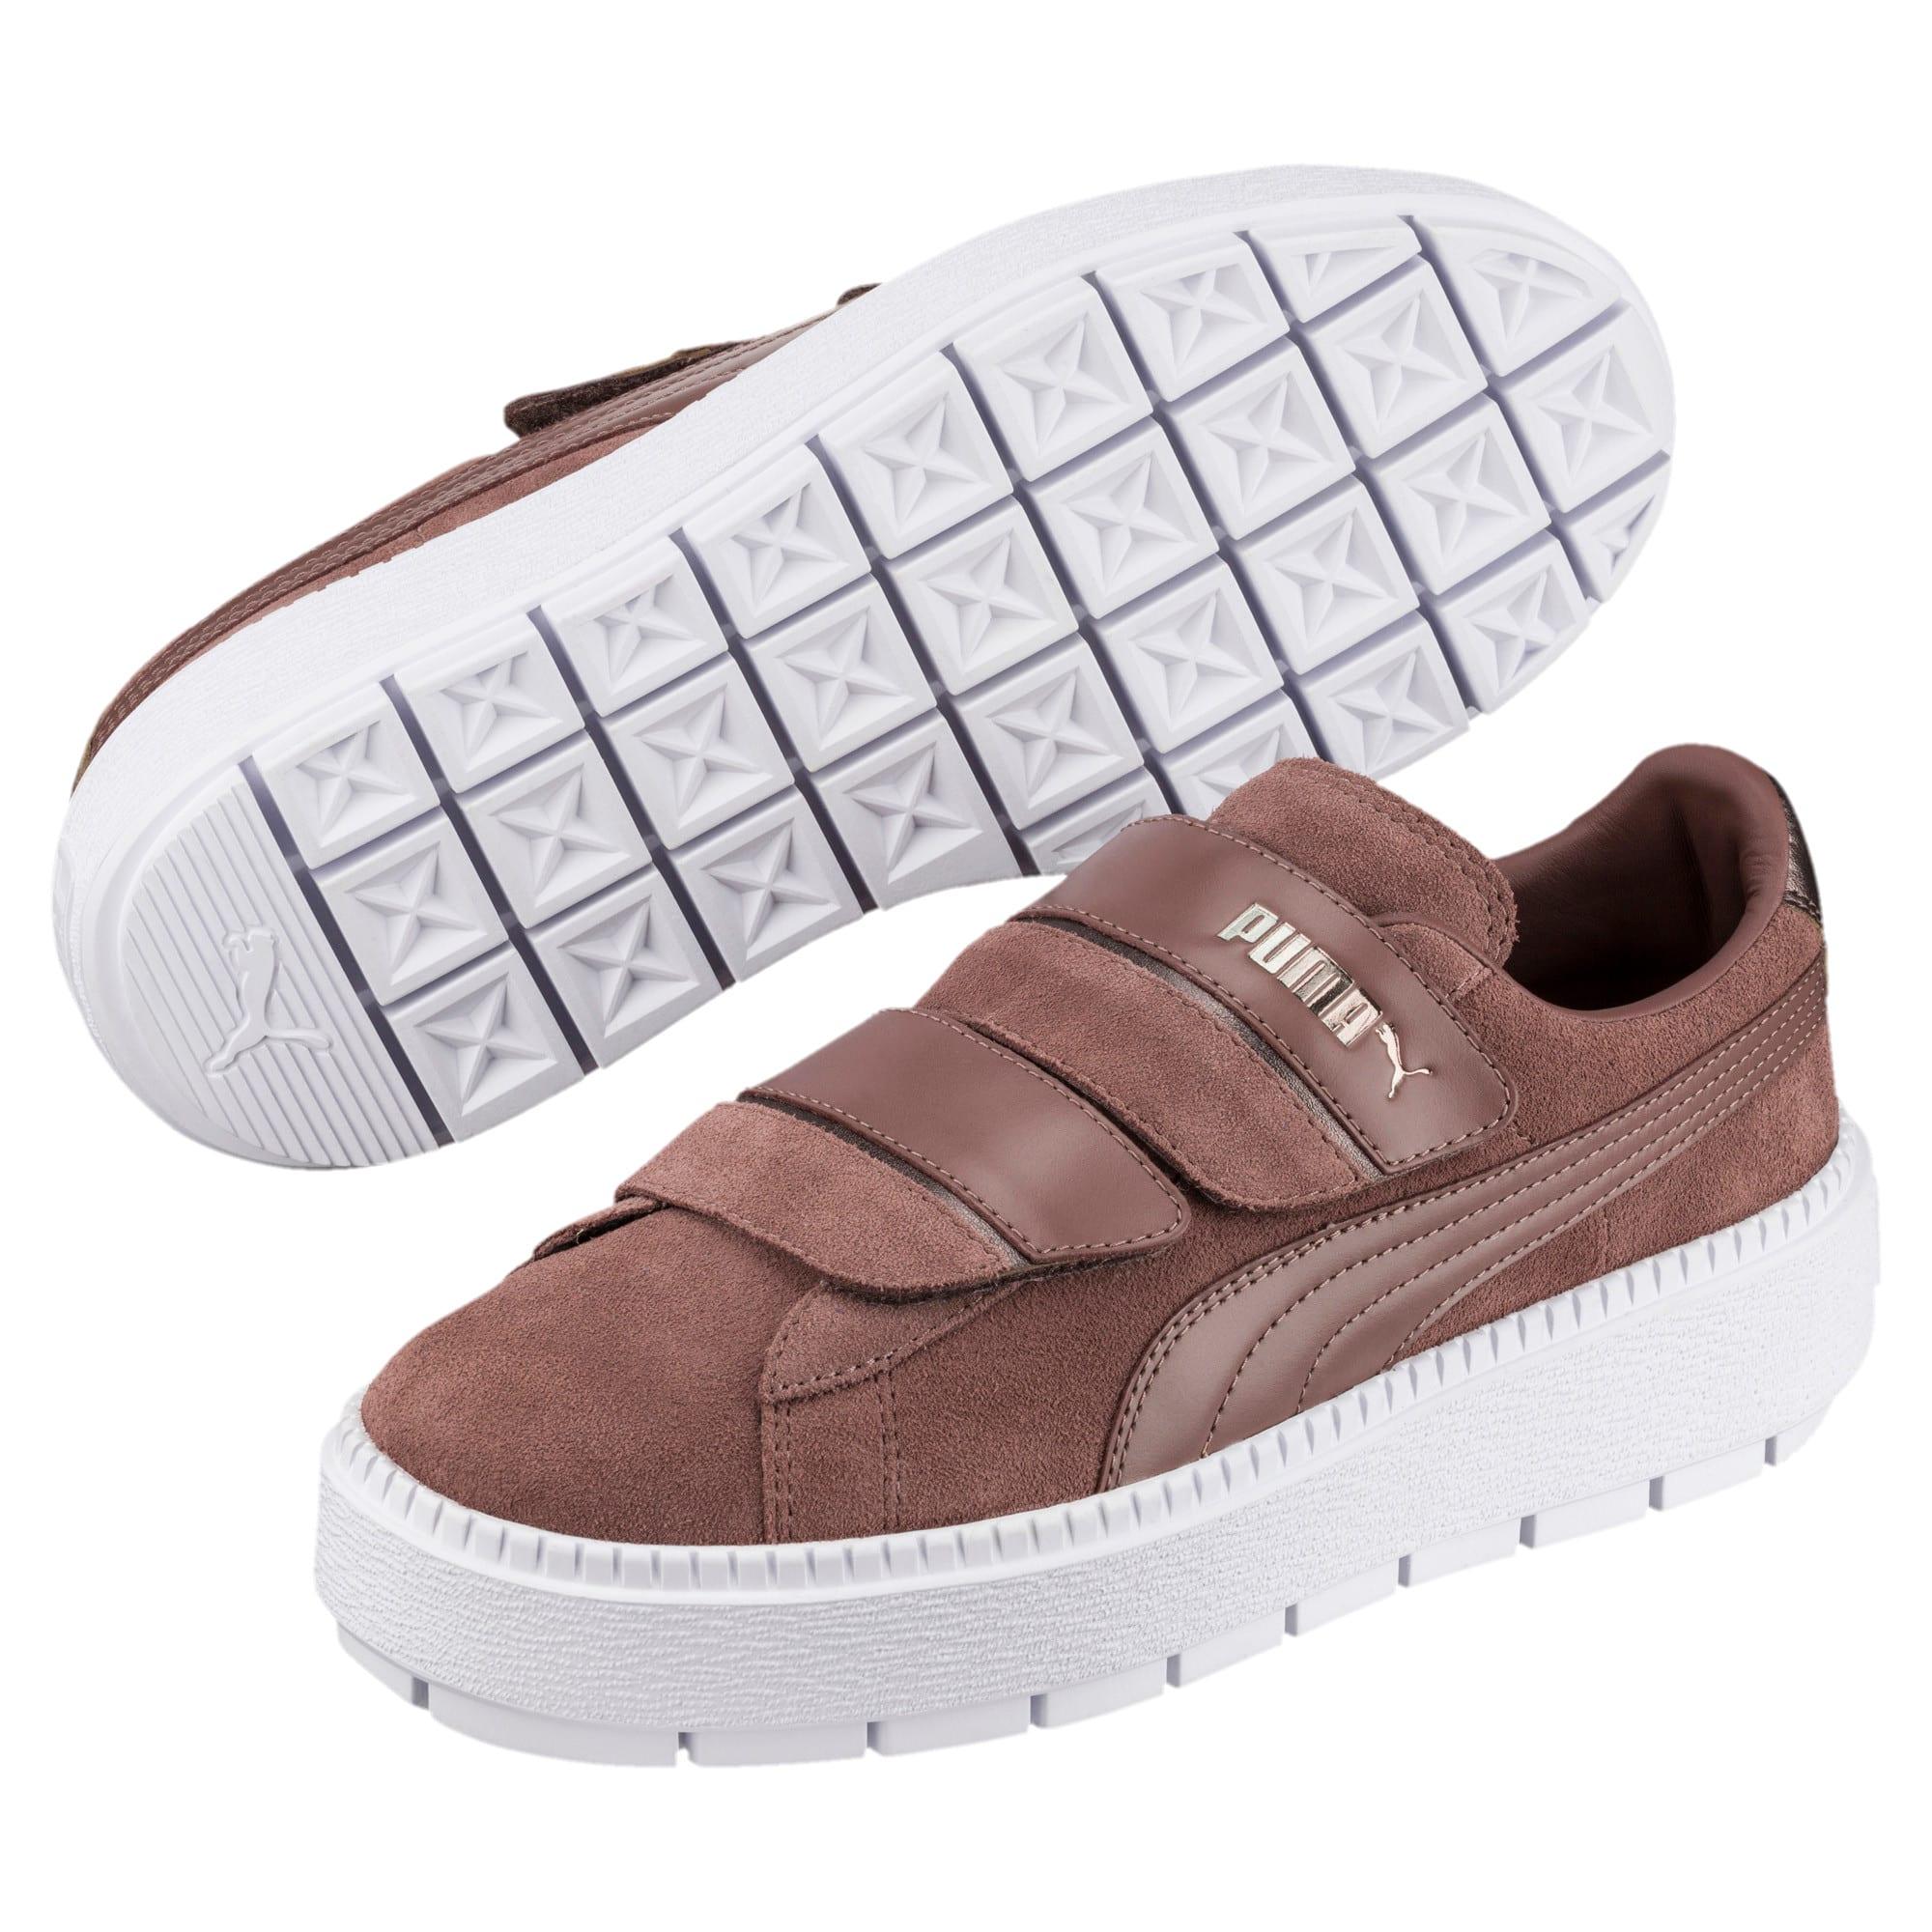 Thumbnail 2 of Platform Trace Strap Esc Women's Sneakers, Peppercorn-Peppercorn, medium